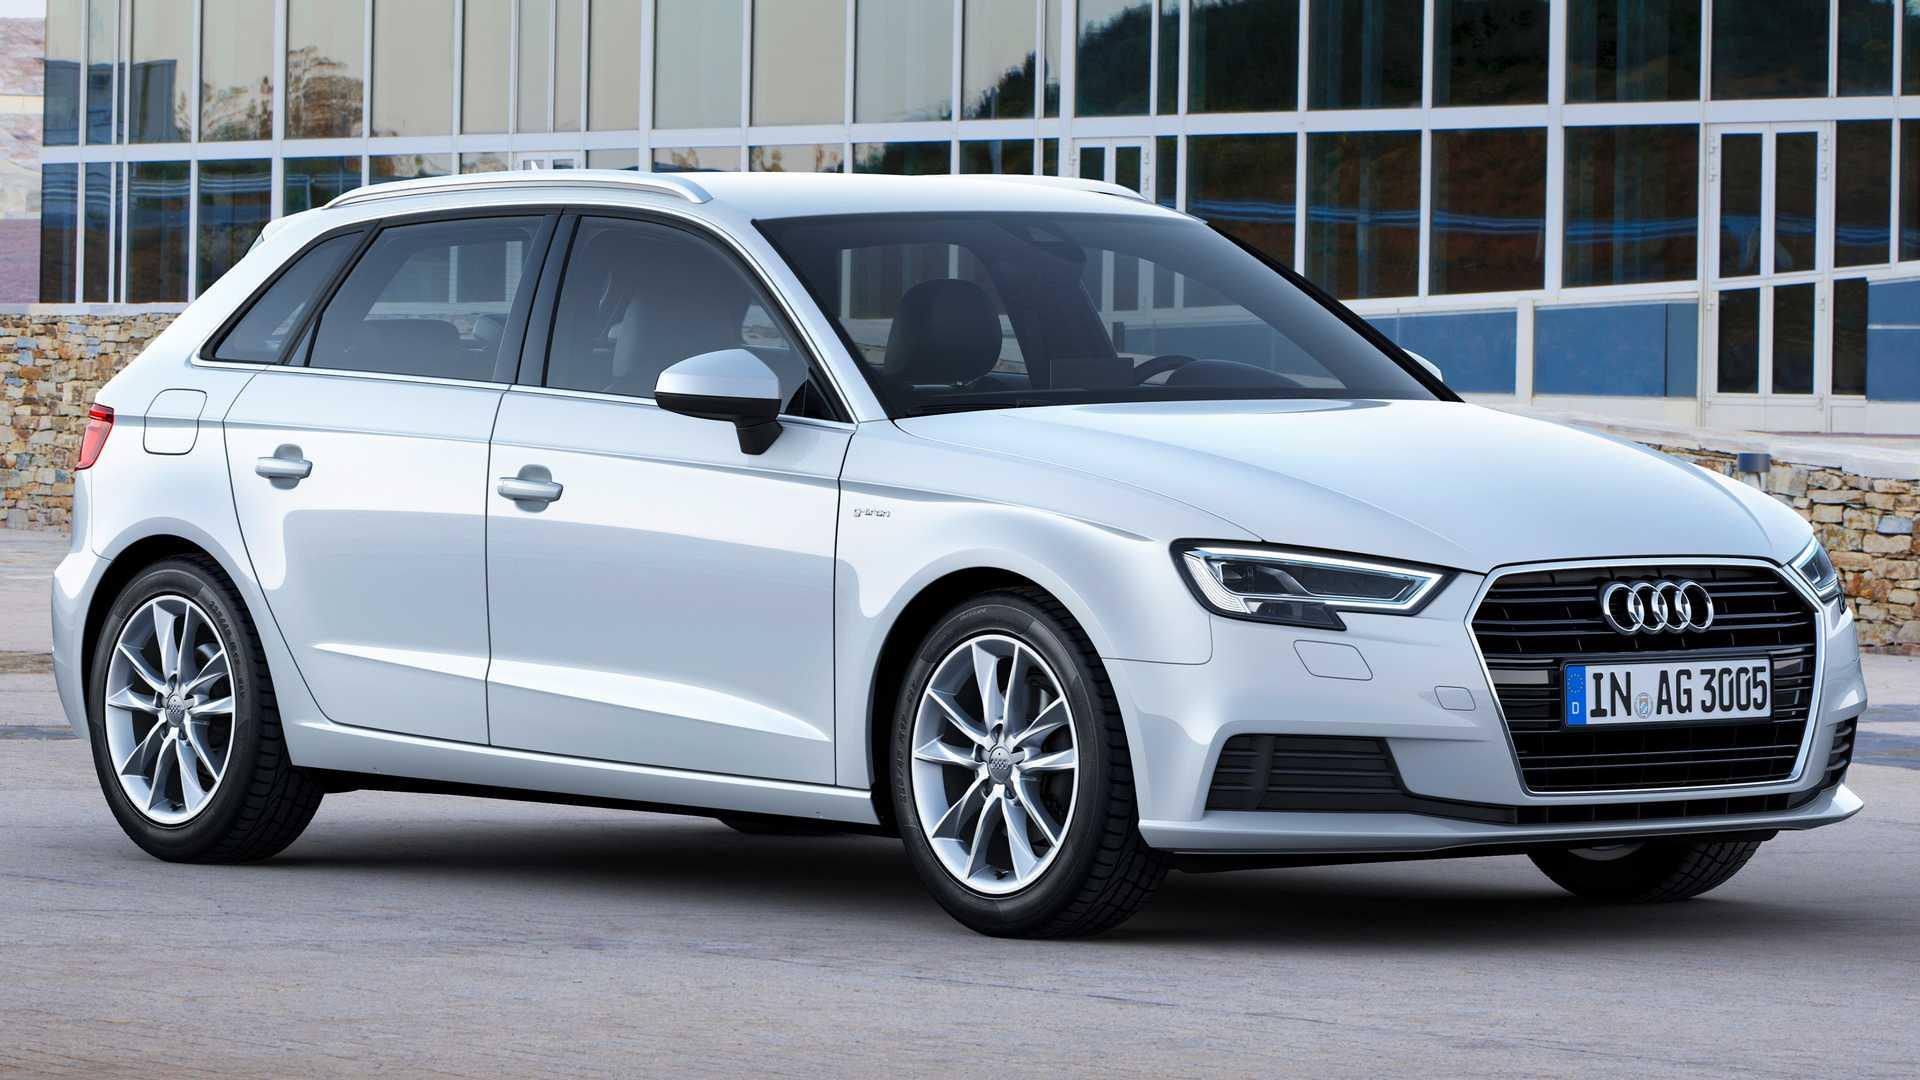 2019 Audi A3 Sportback 1.5 TFSI